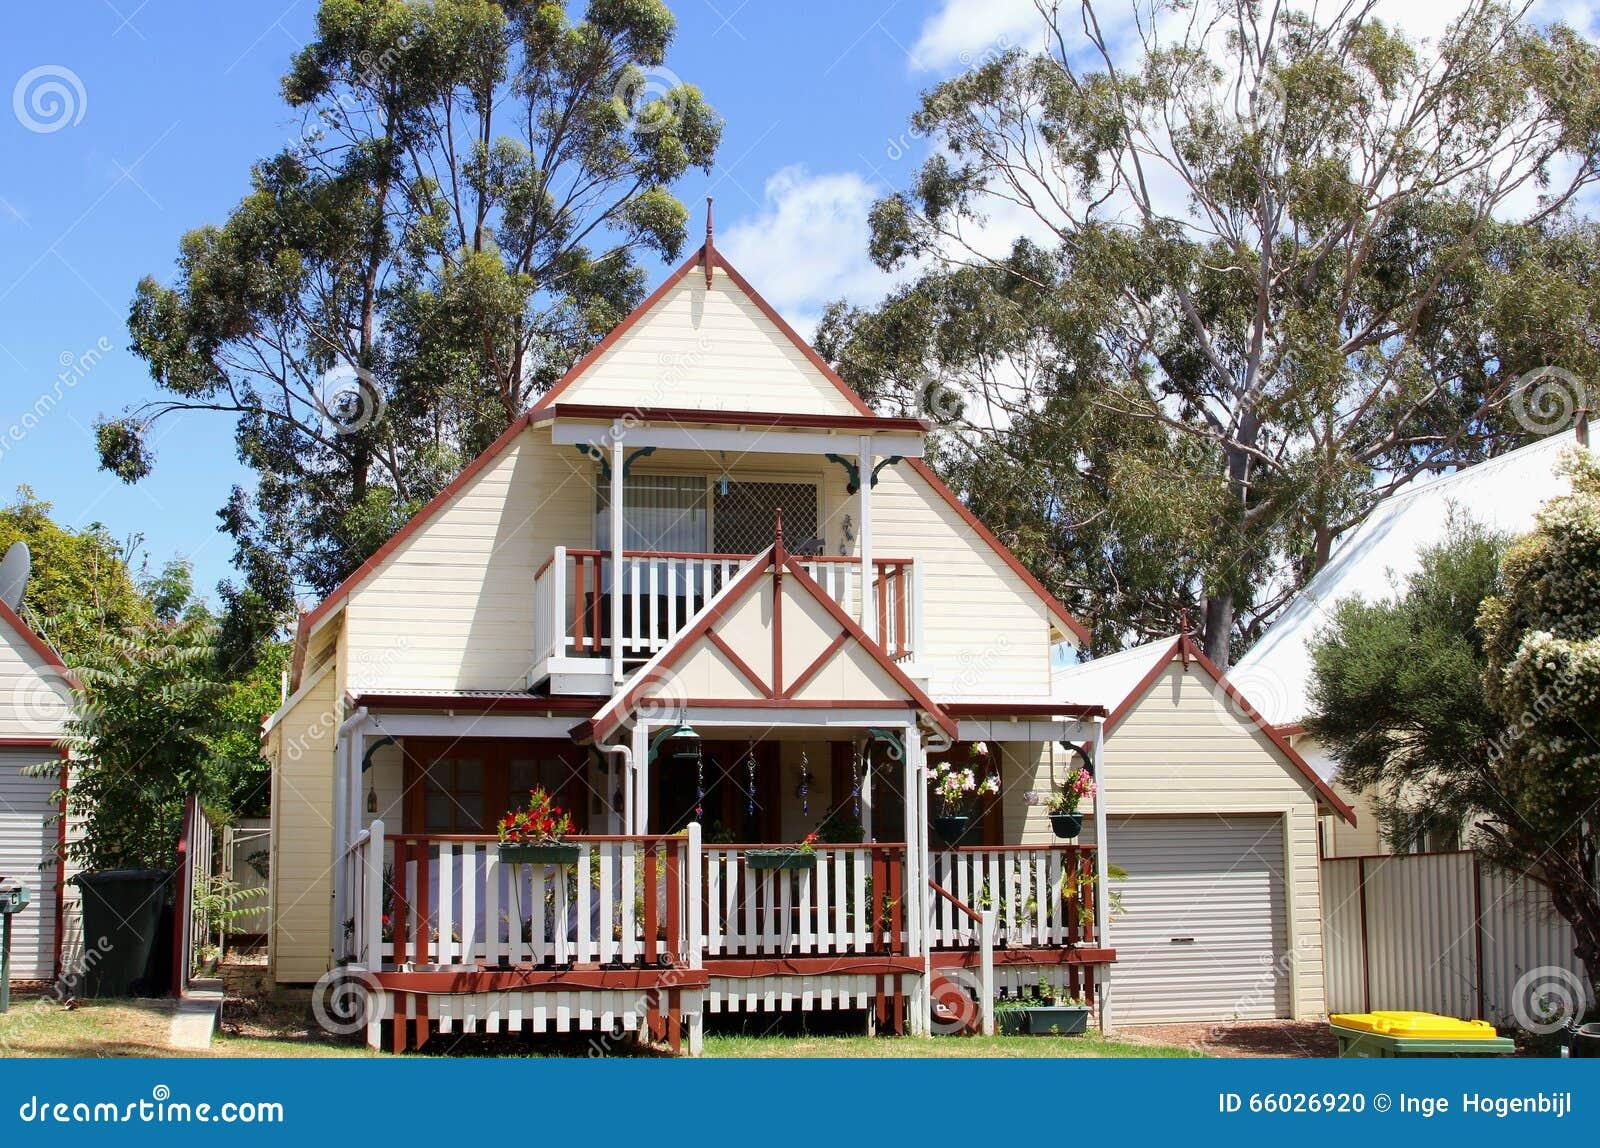 Idyllic wooden house with veranda australia